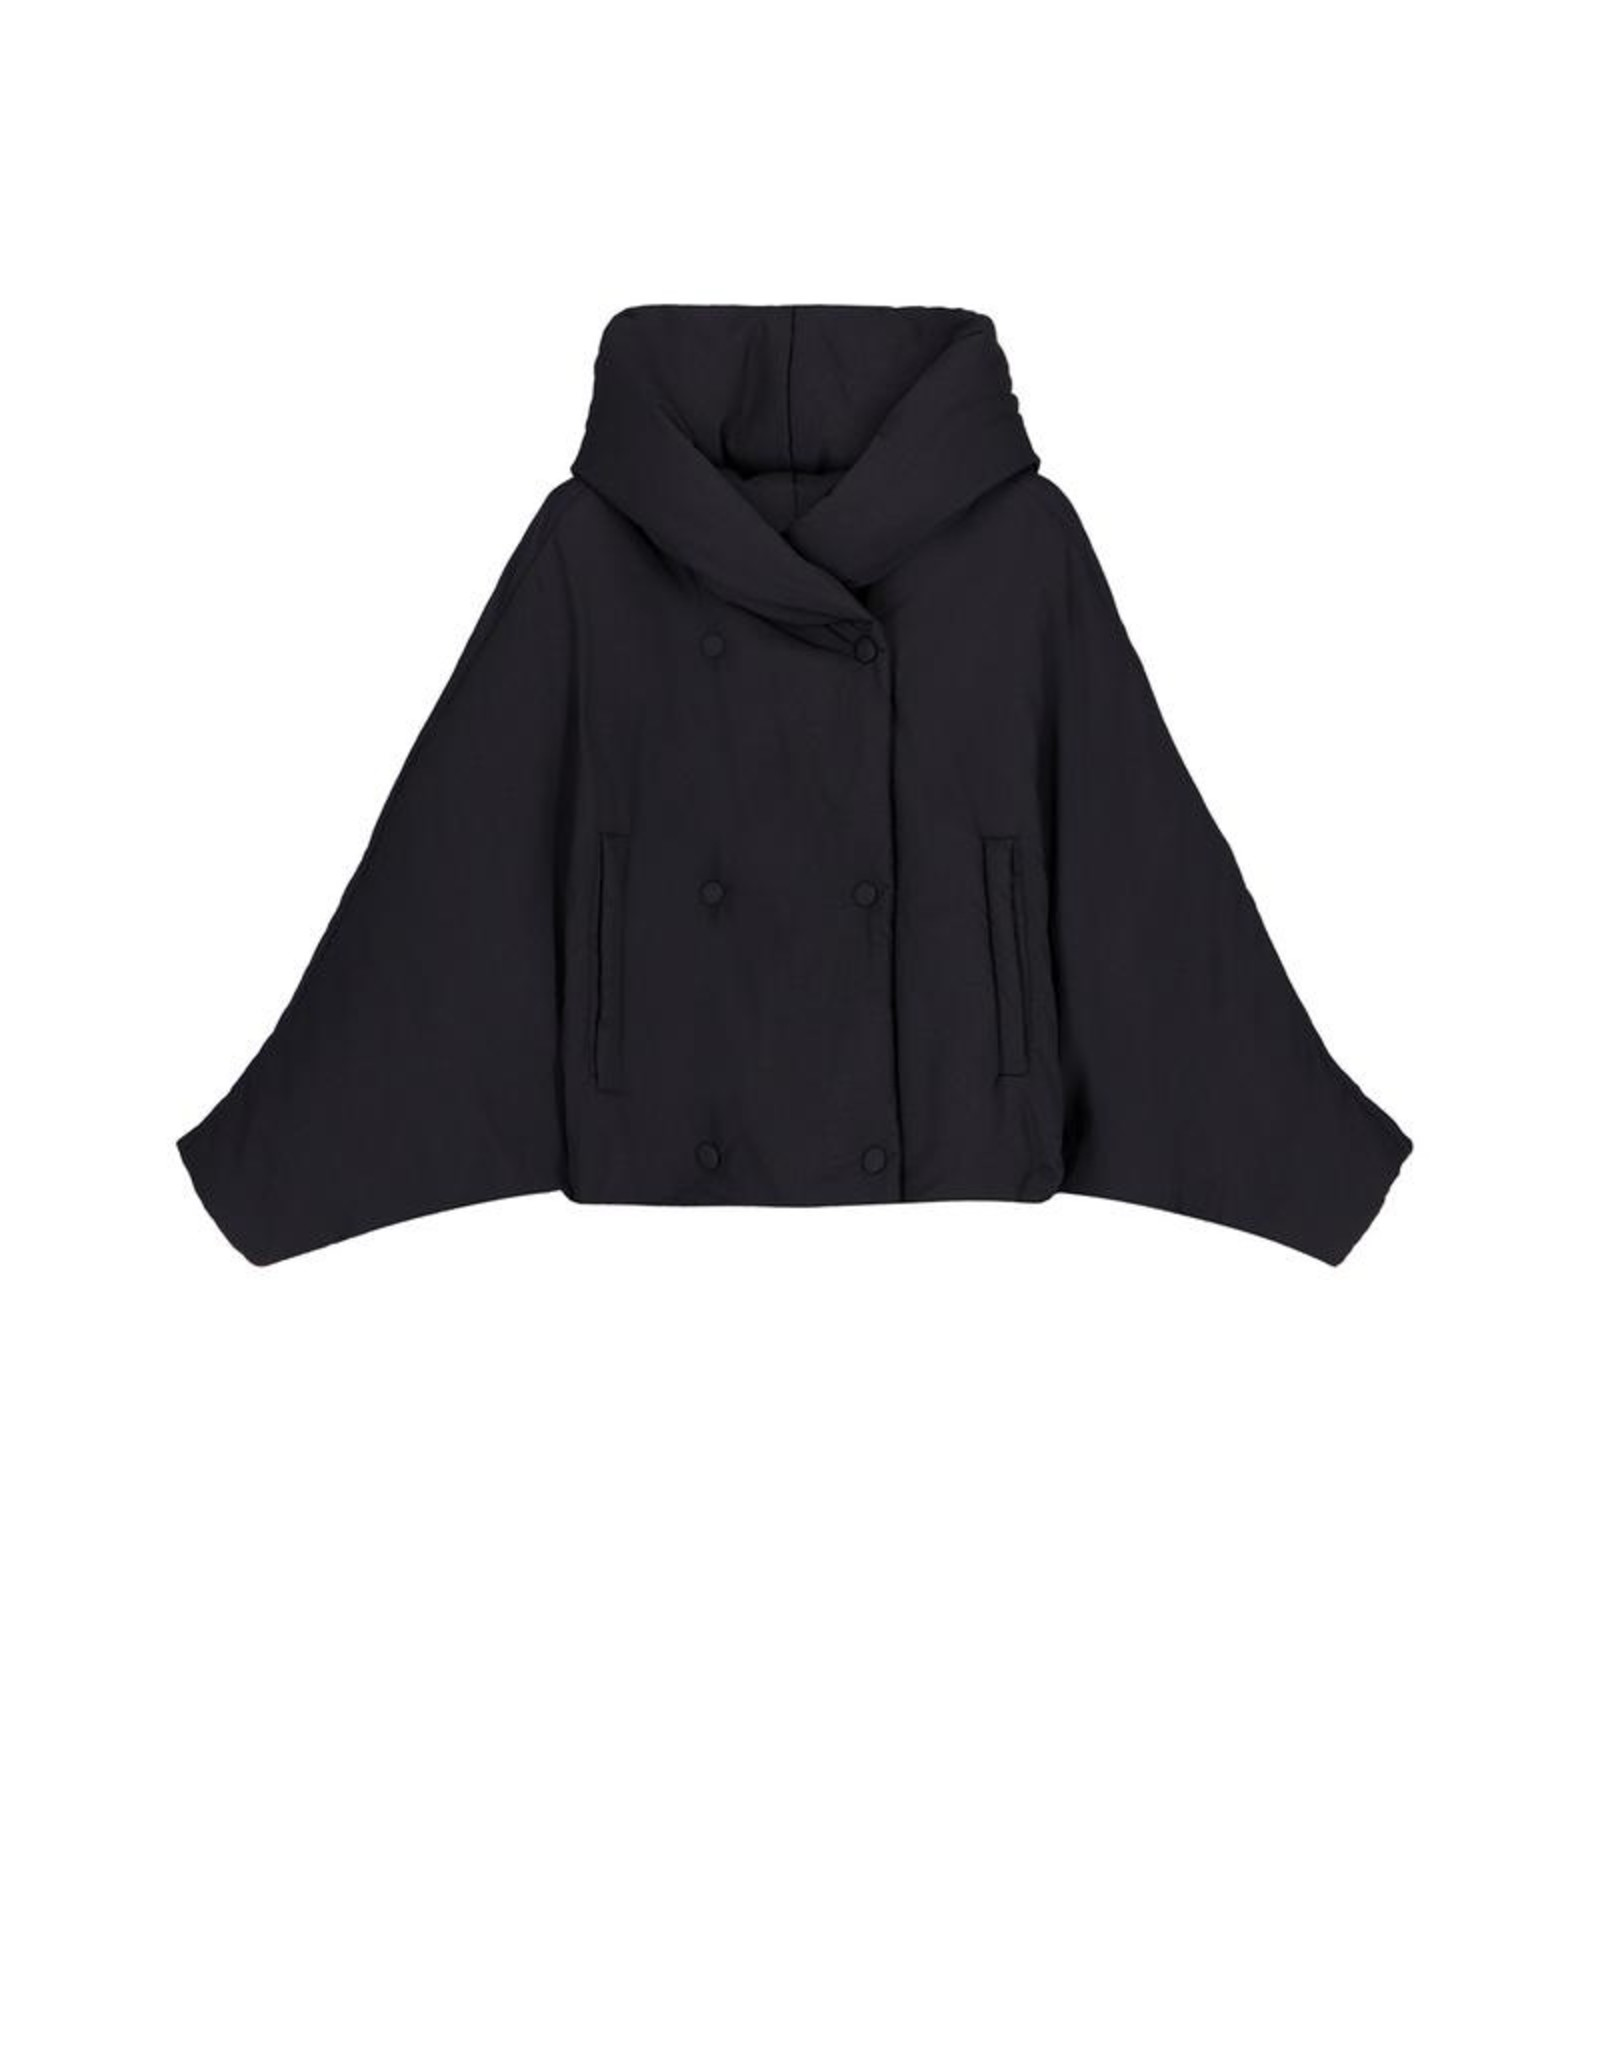 OOF Short Bat wing hooded jacket